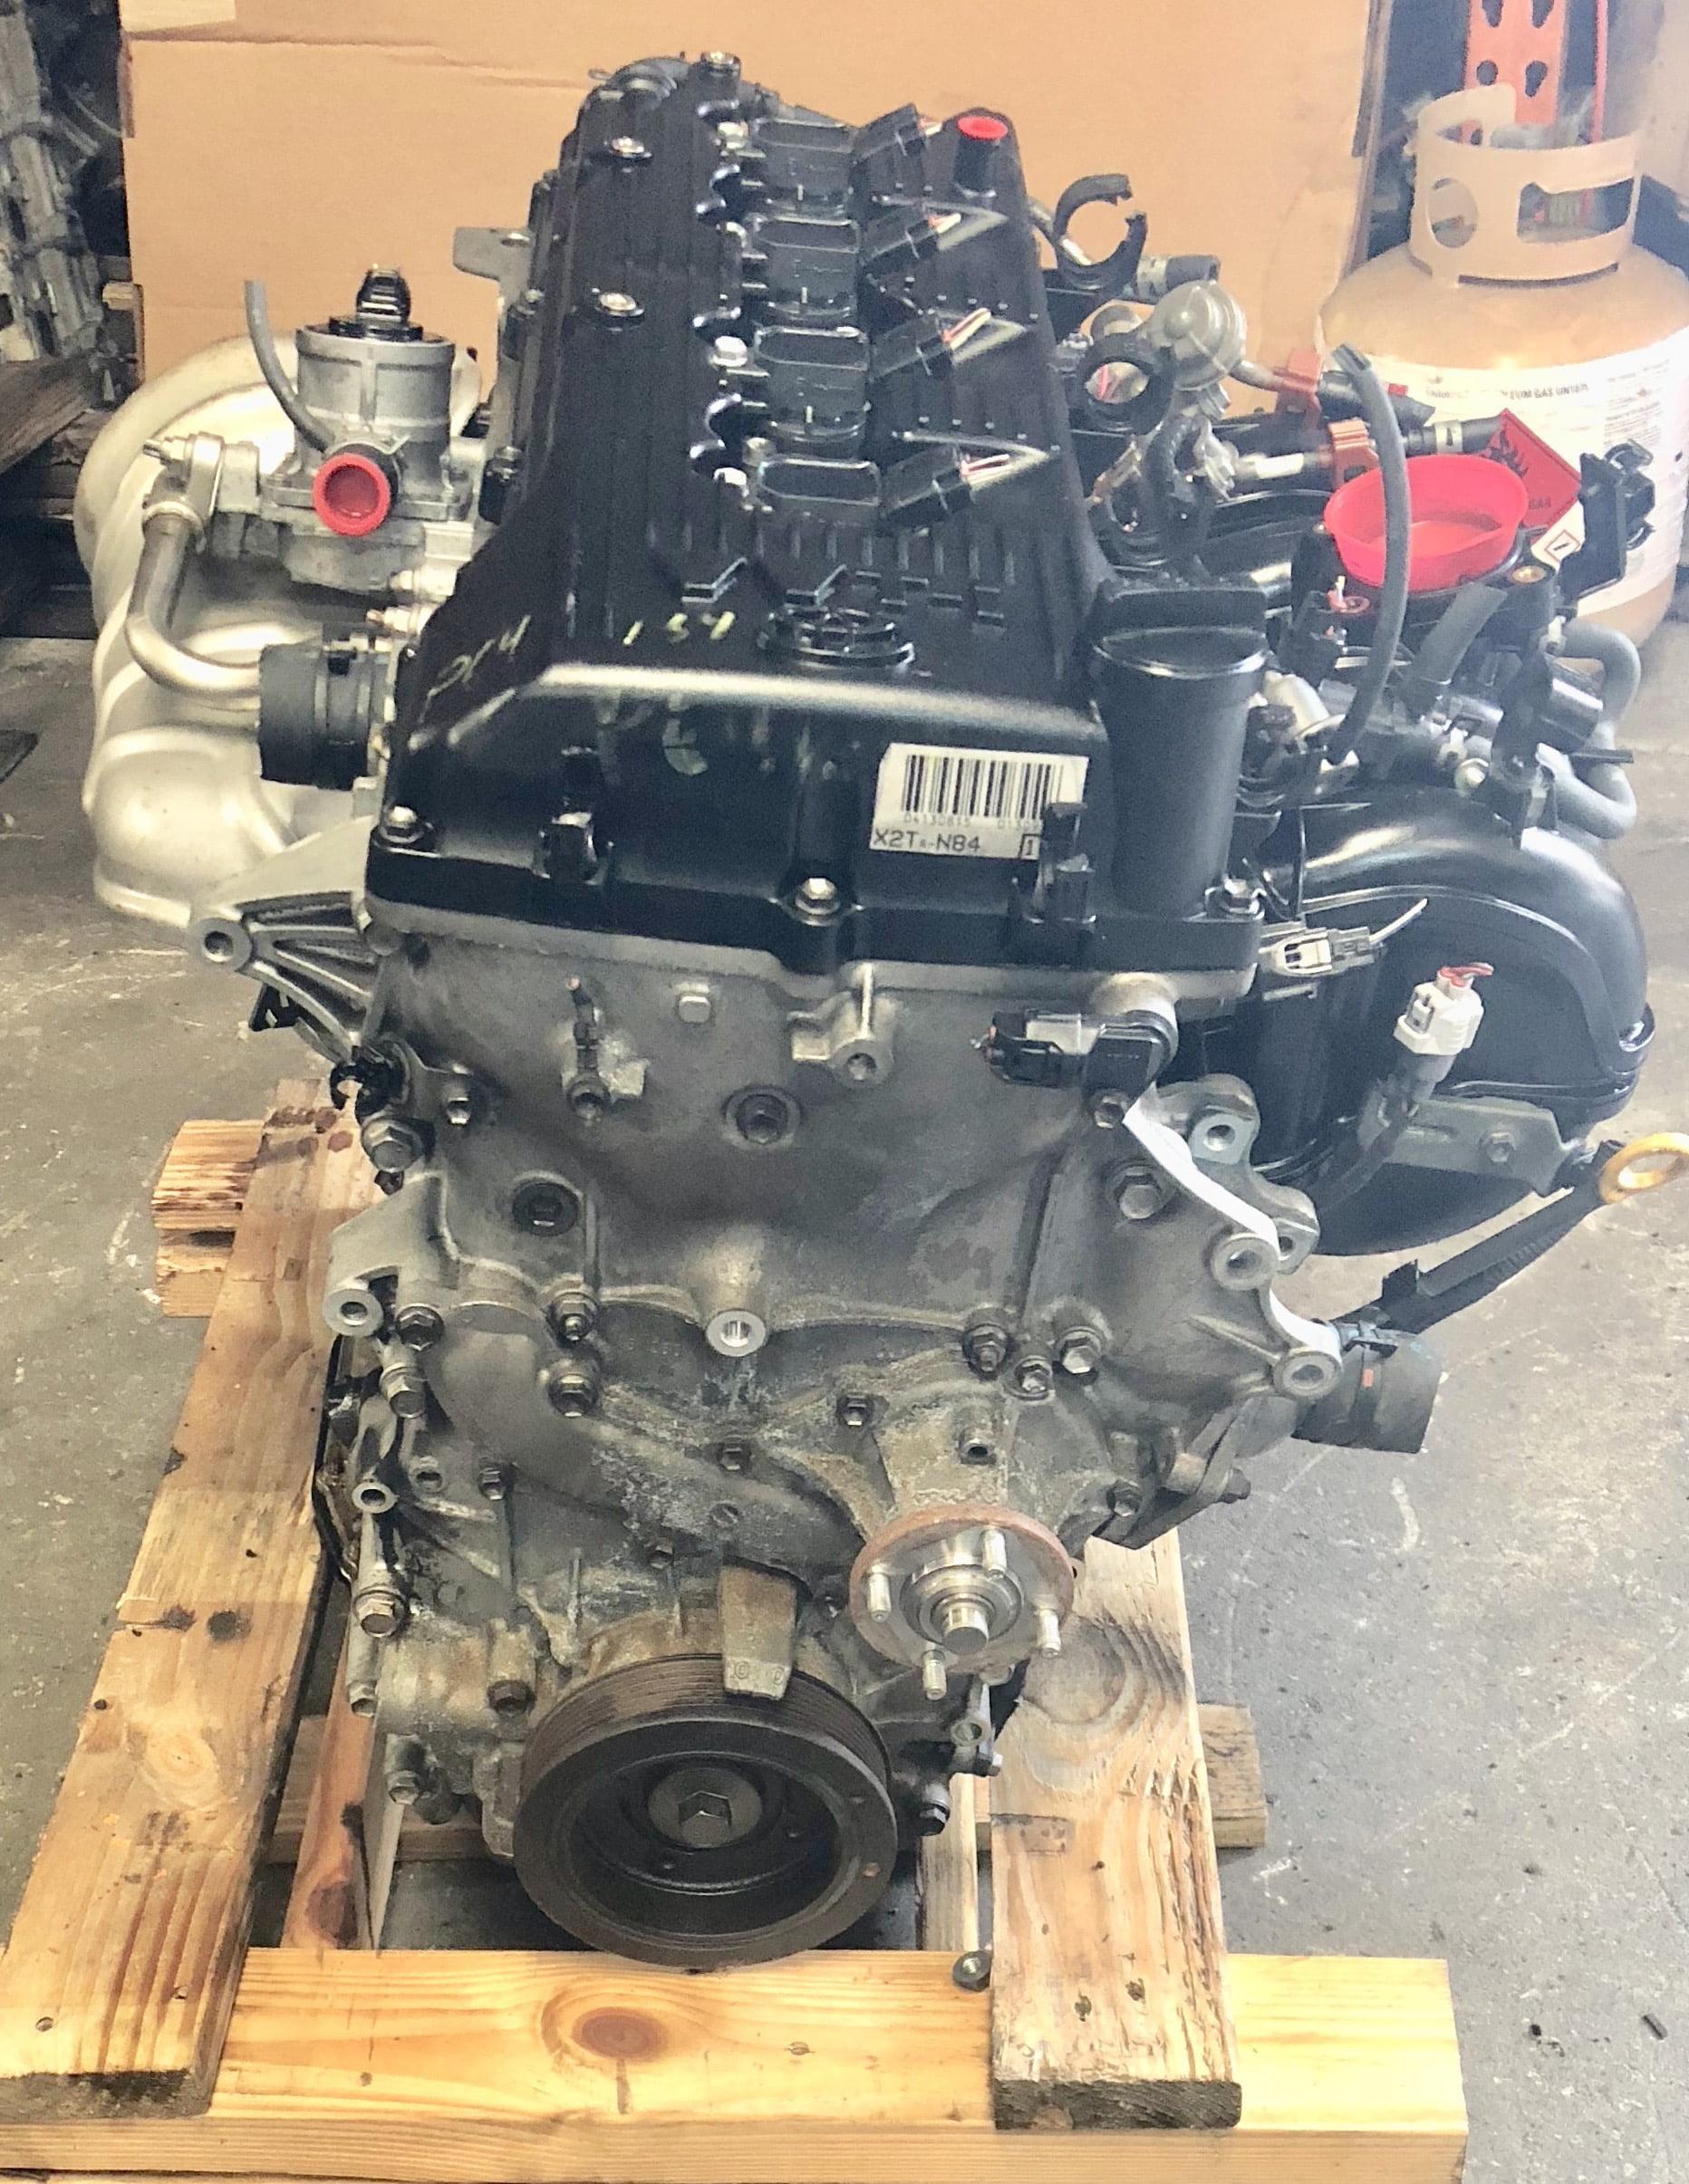 toyota tacoma 2 7l engine 2005 2006 2007 2008 2009 2010 2011 2012 2013 2014 2015